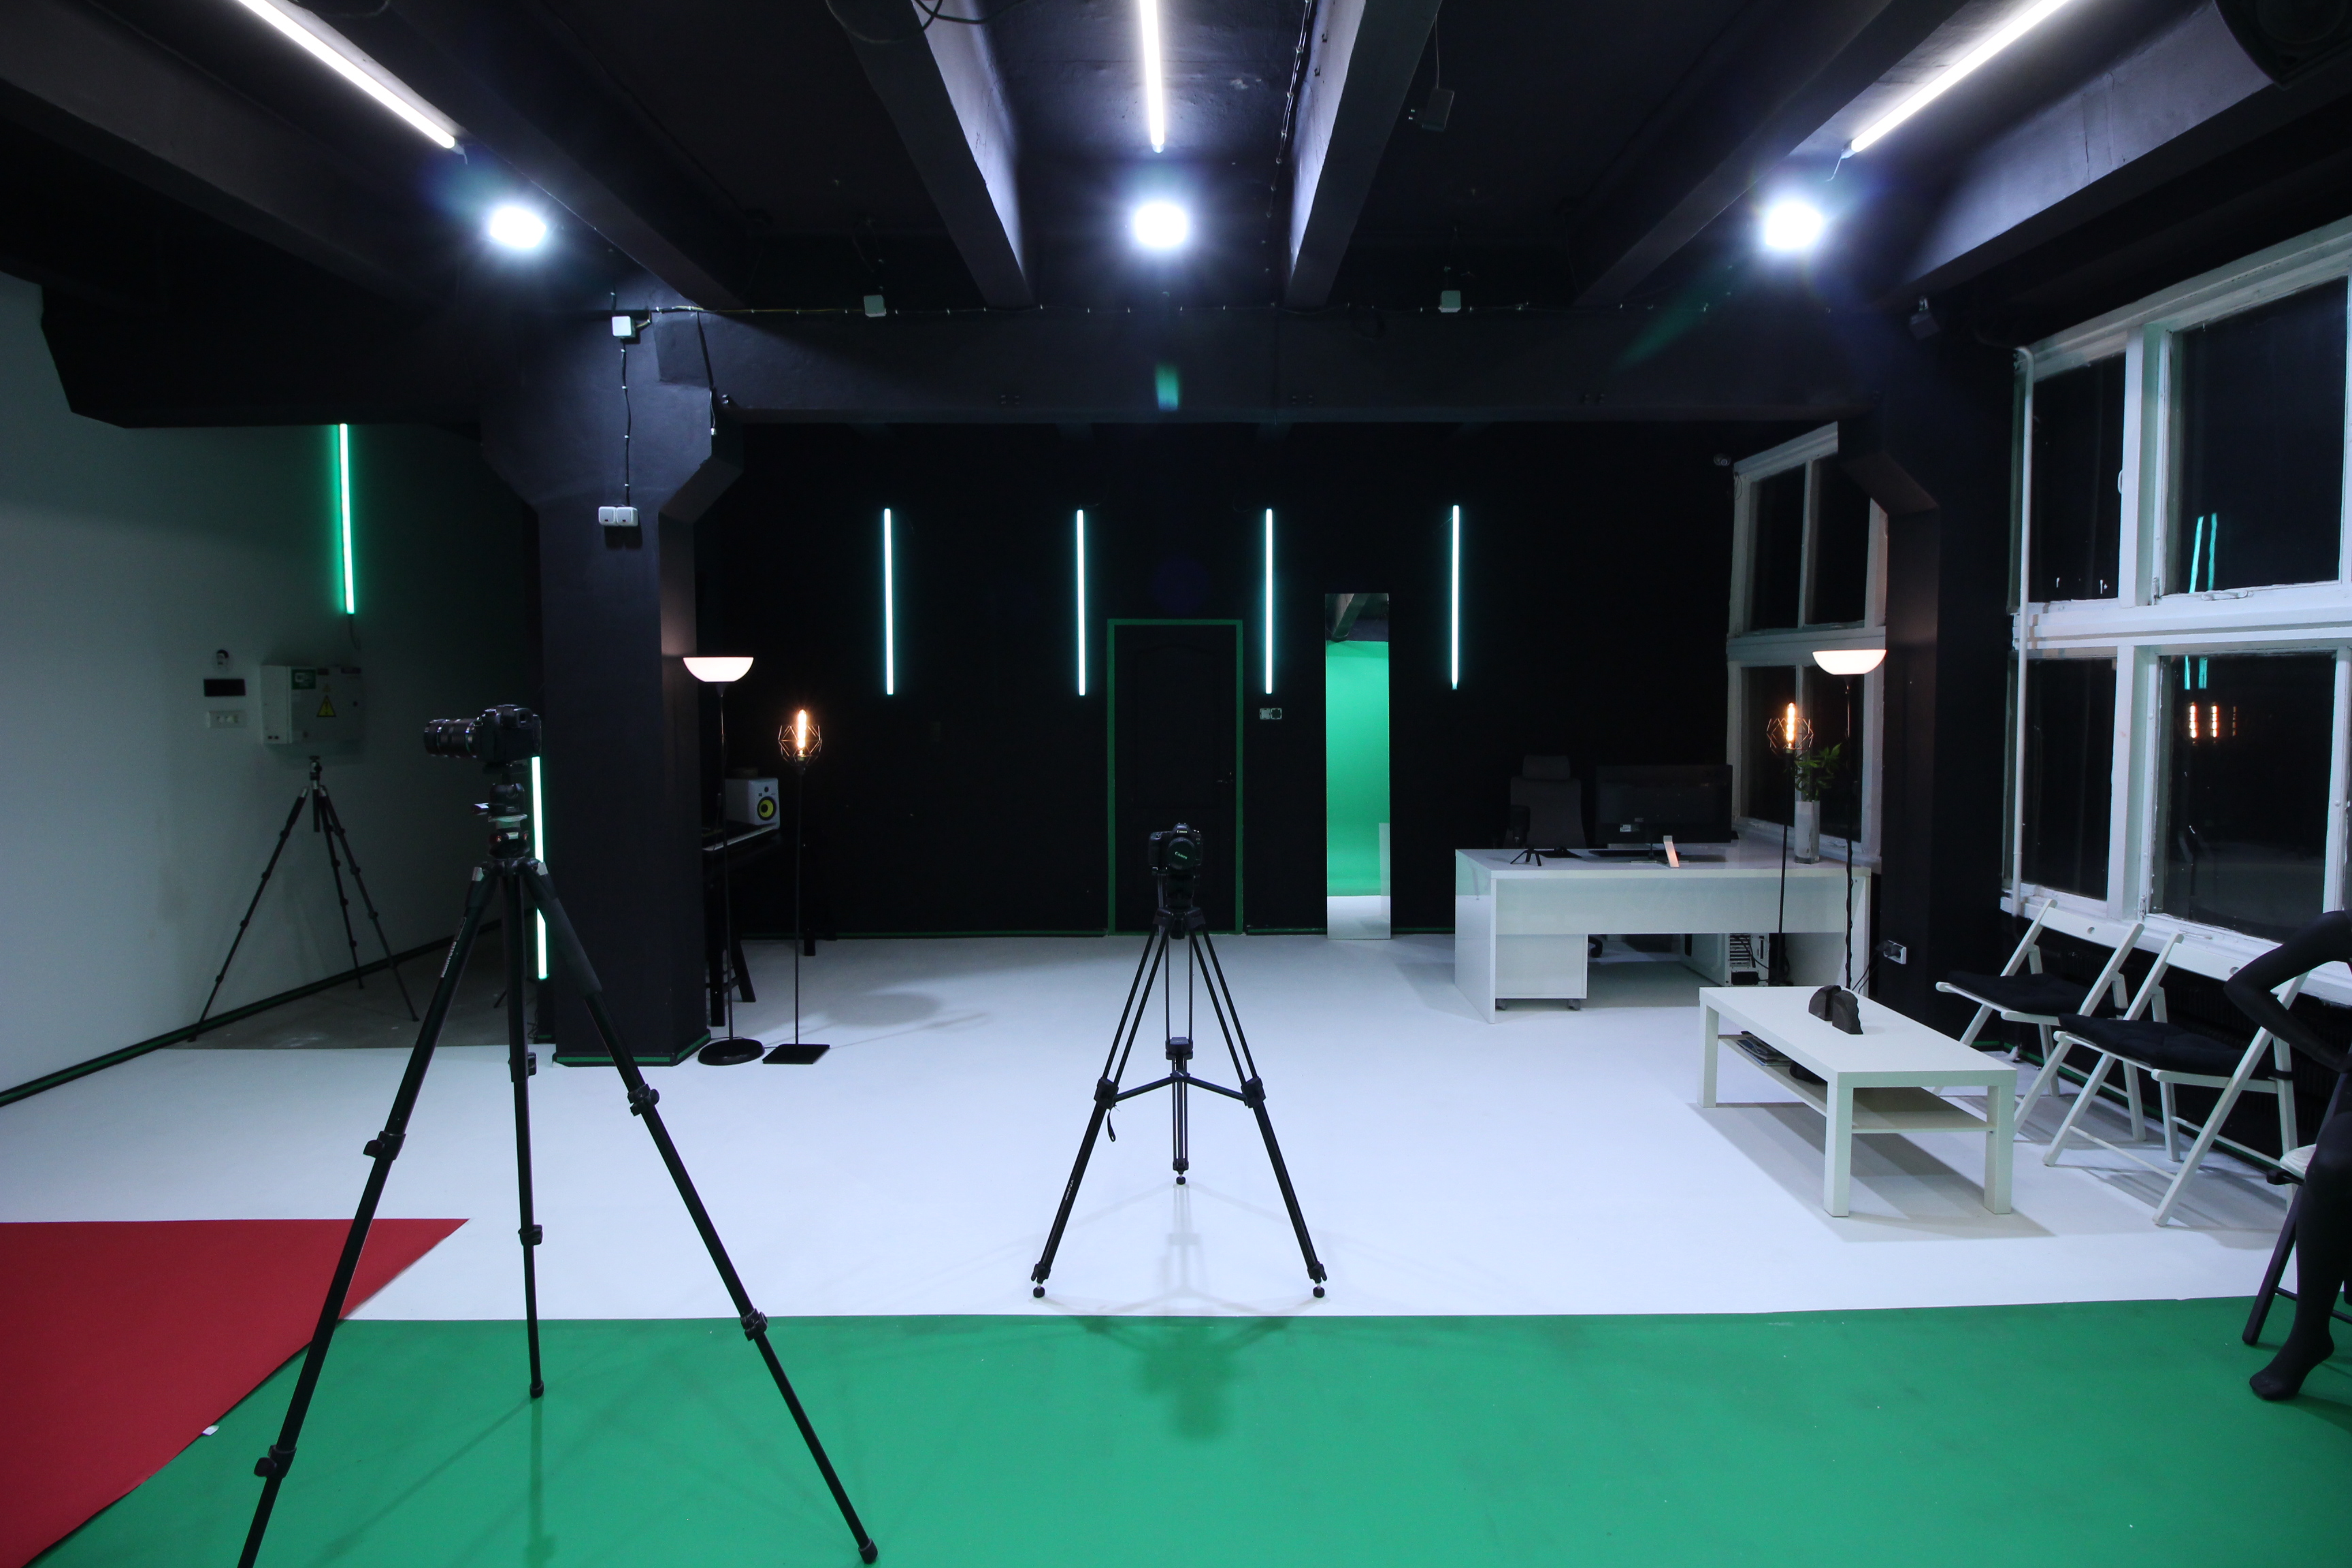 chroma key video production studio